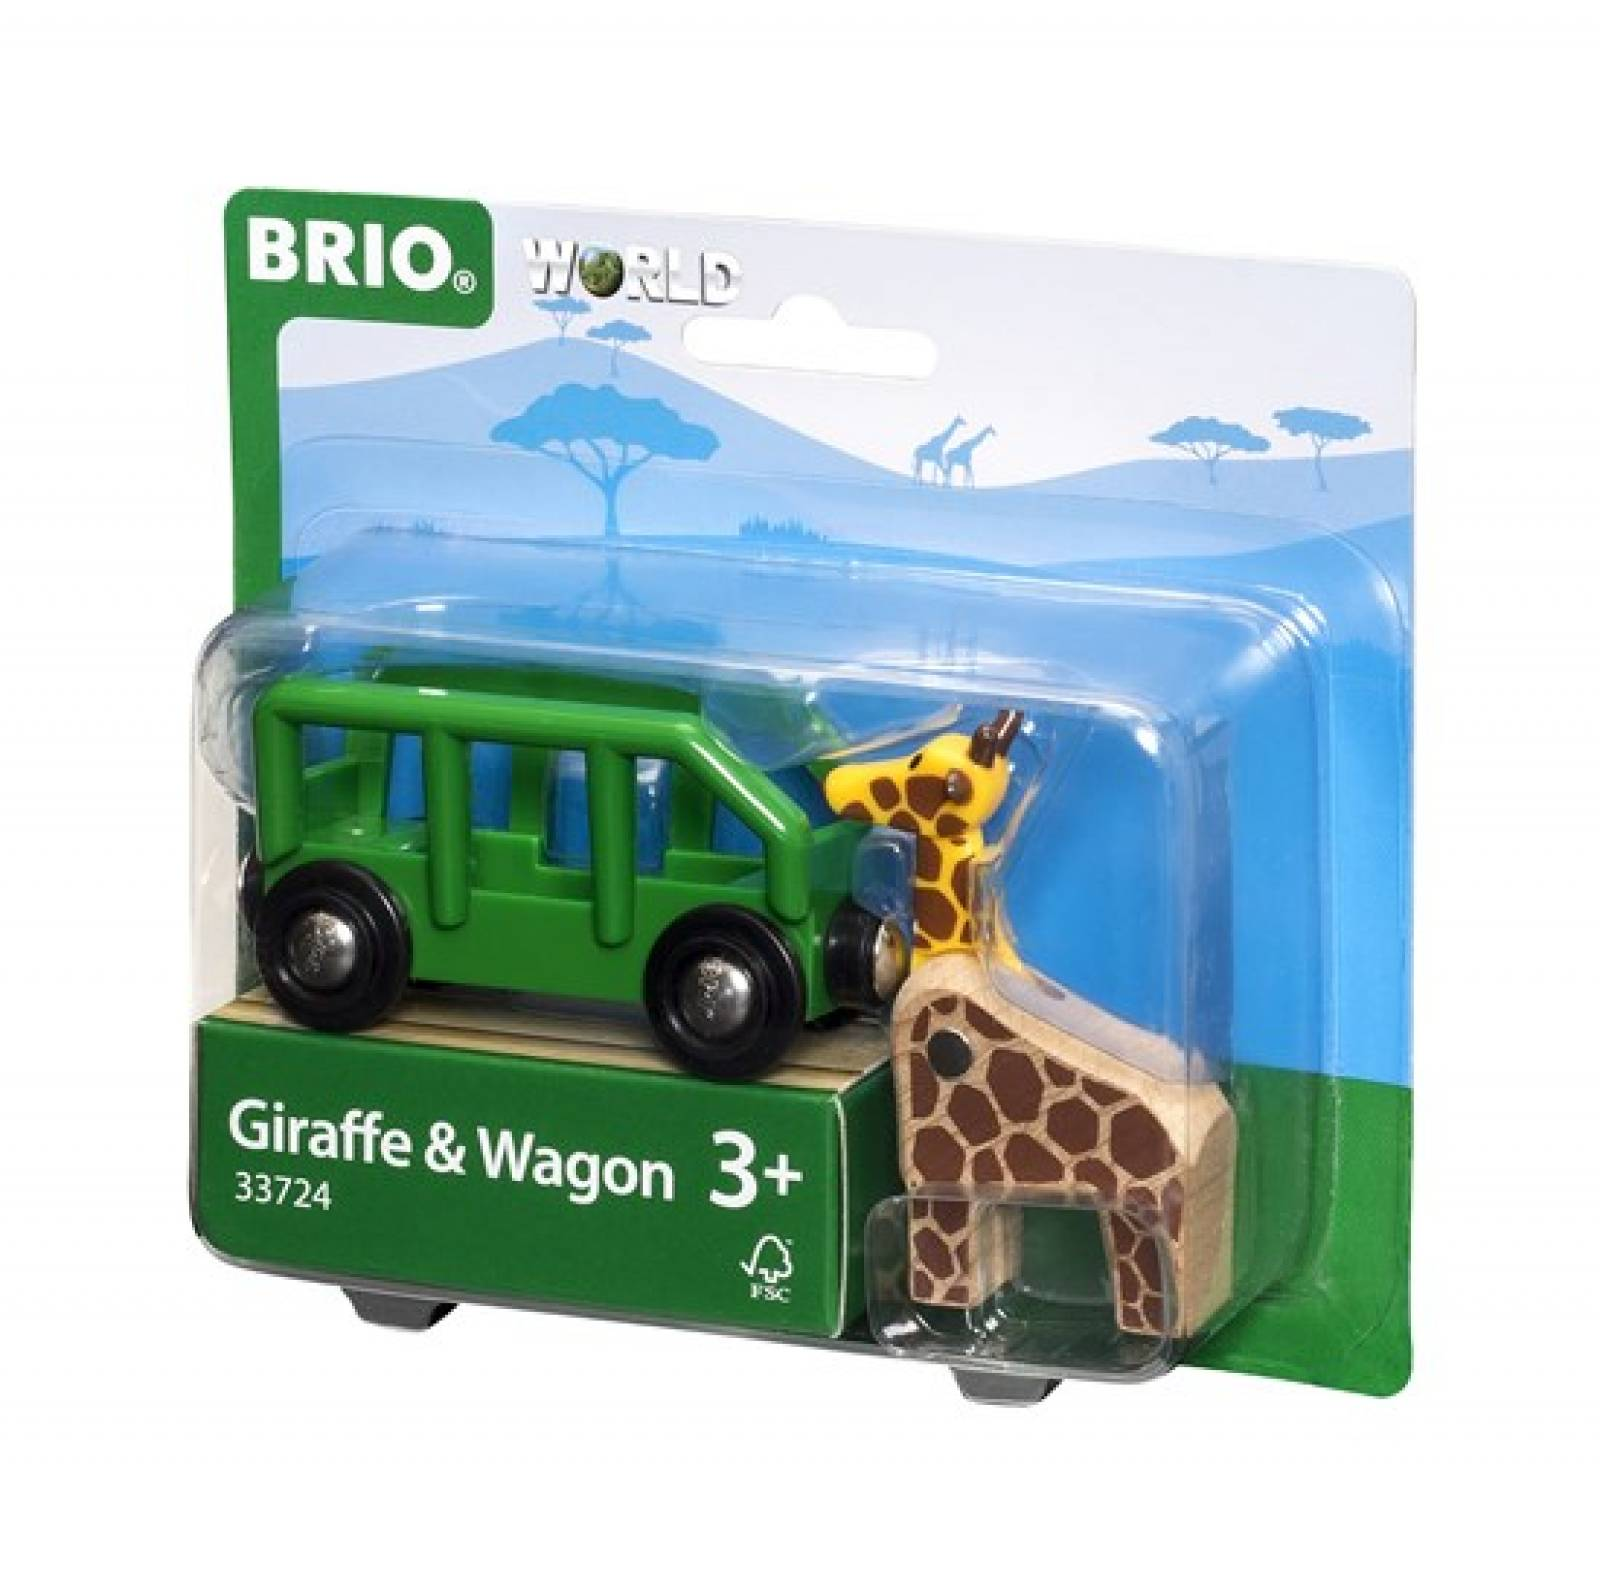 Giraffe and Wagon BRIO Wooden Railway Age 3+